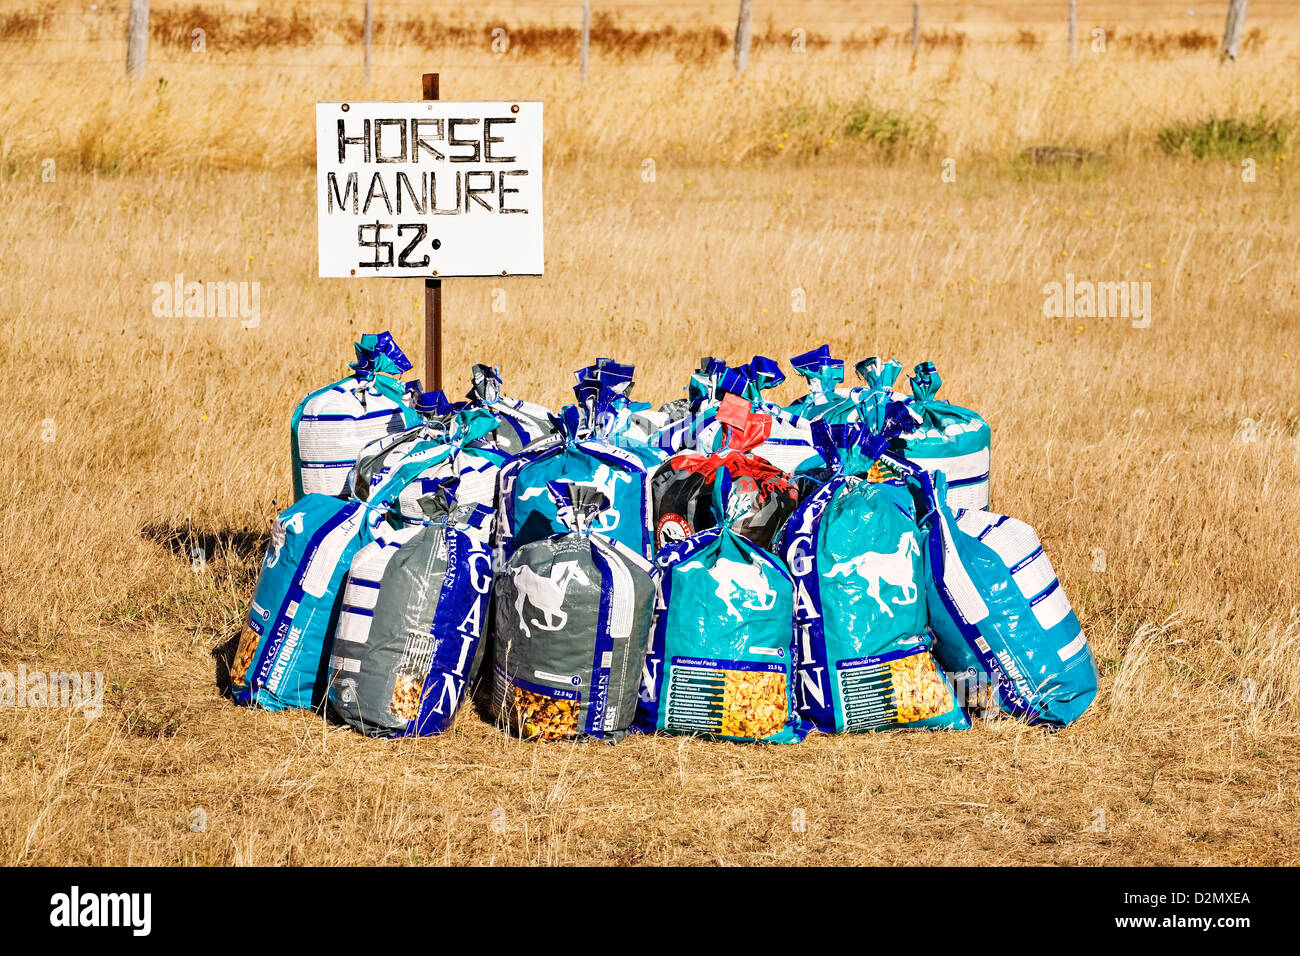 Ballarat Australia / Bags Of Horse Manure For Sale For Use As Garden  Fertilizer In Victoria Australia.